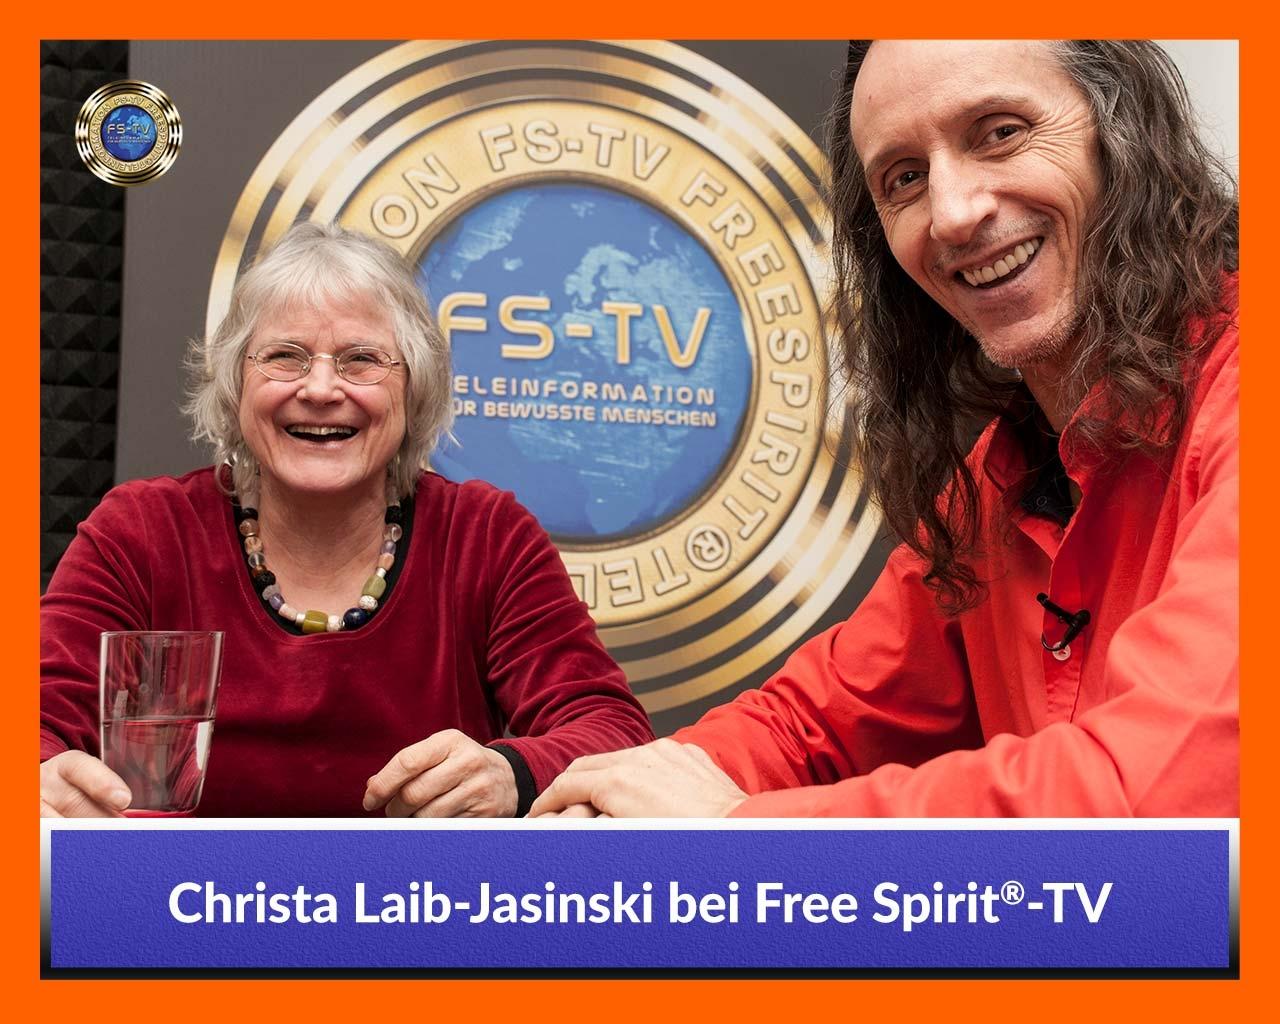 Christa-Laib-Jasinski-03